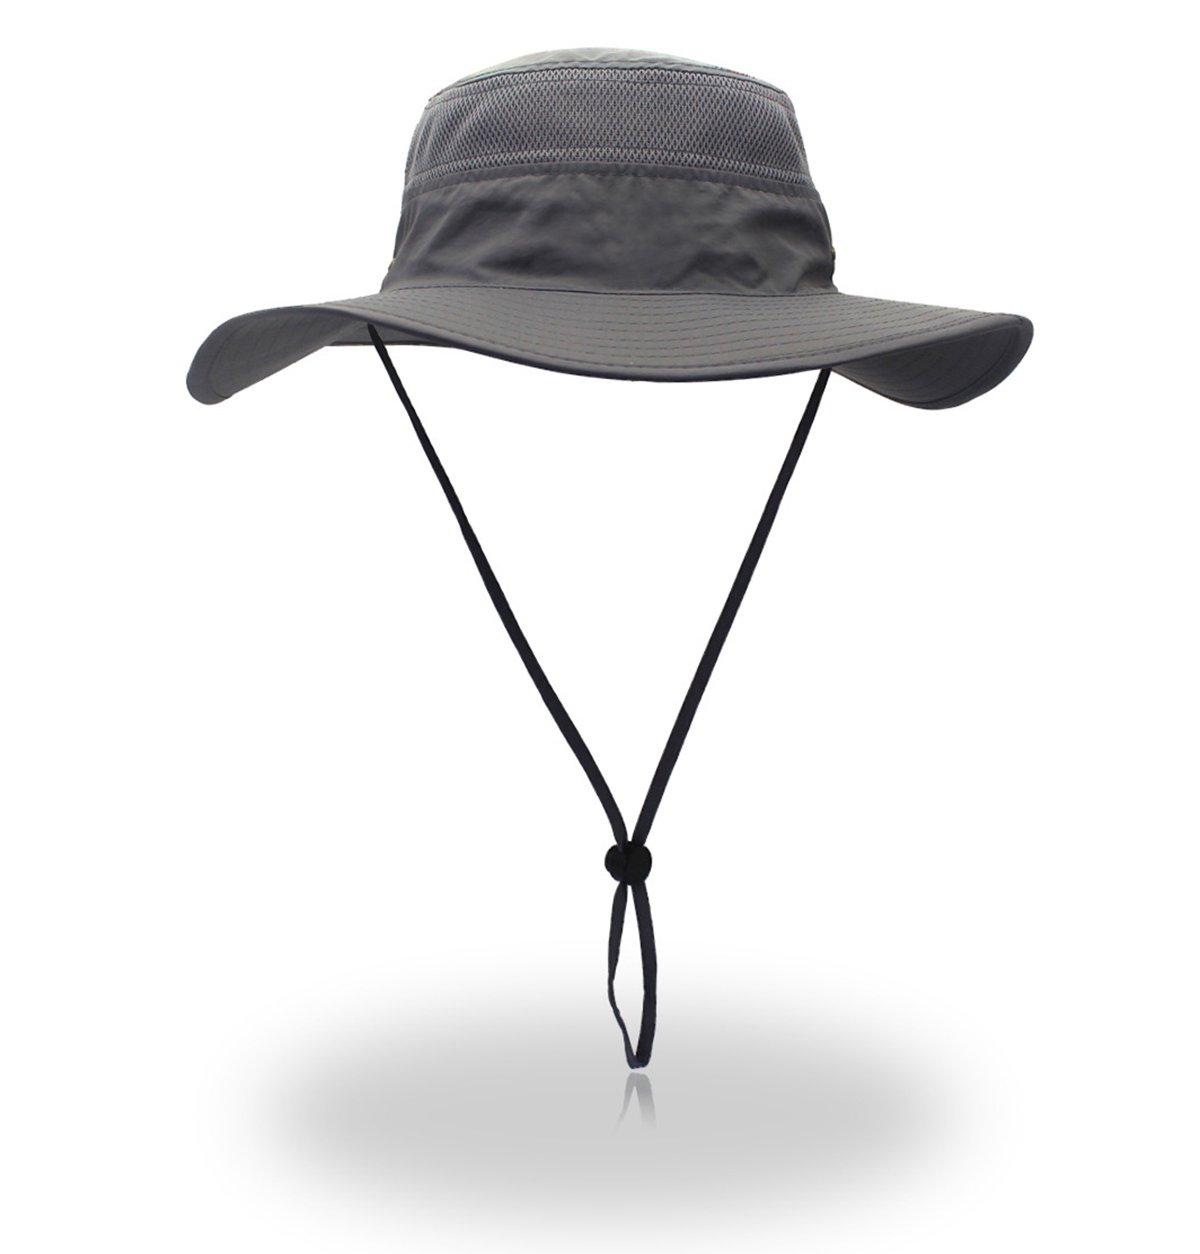 belababy Summer Sun Hat Outdoor Camping Fishing Cap, Light Gray